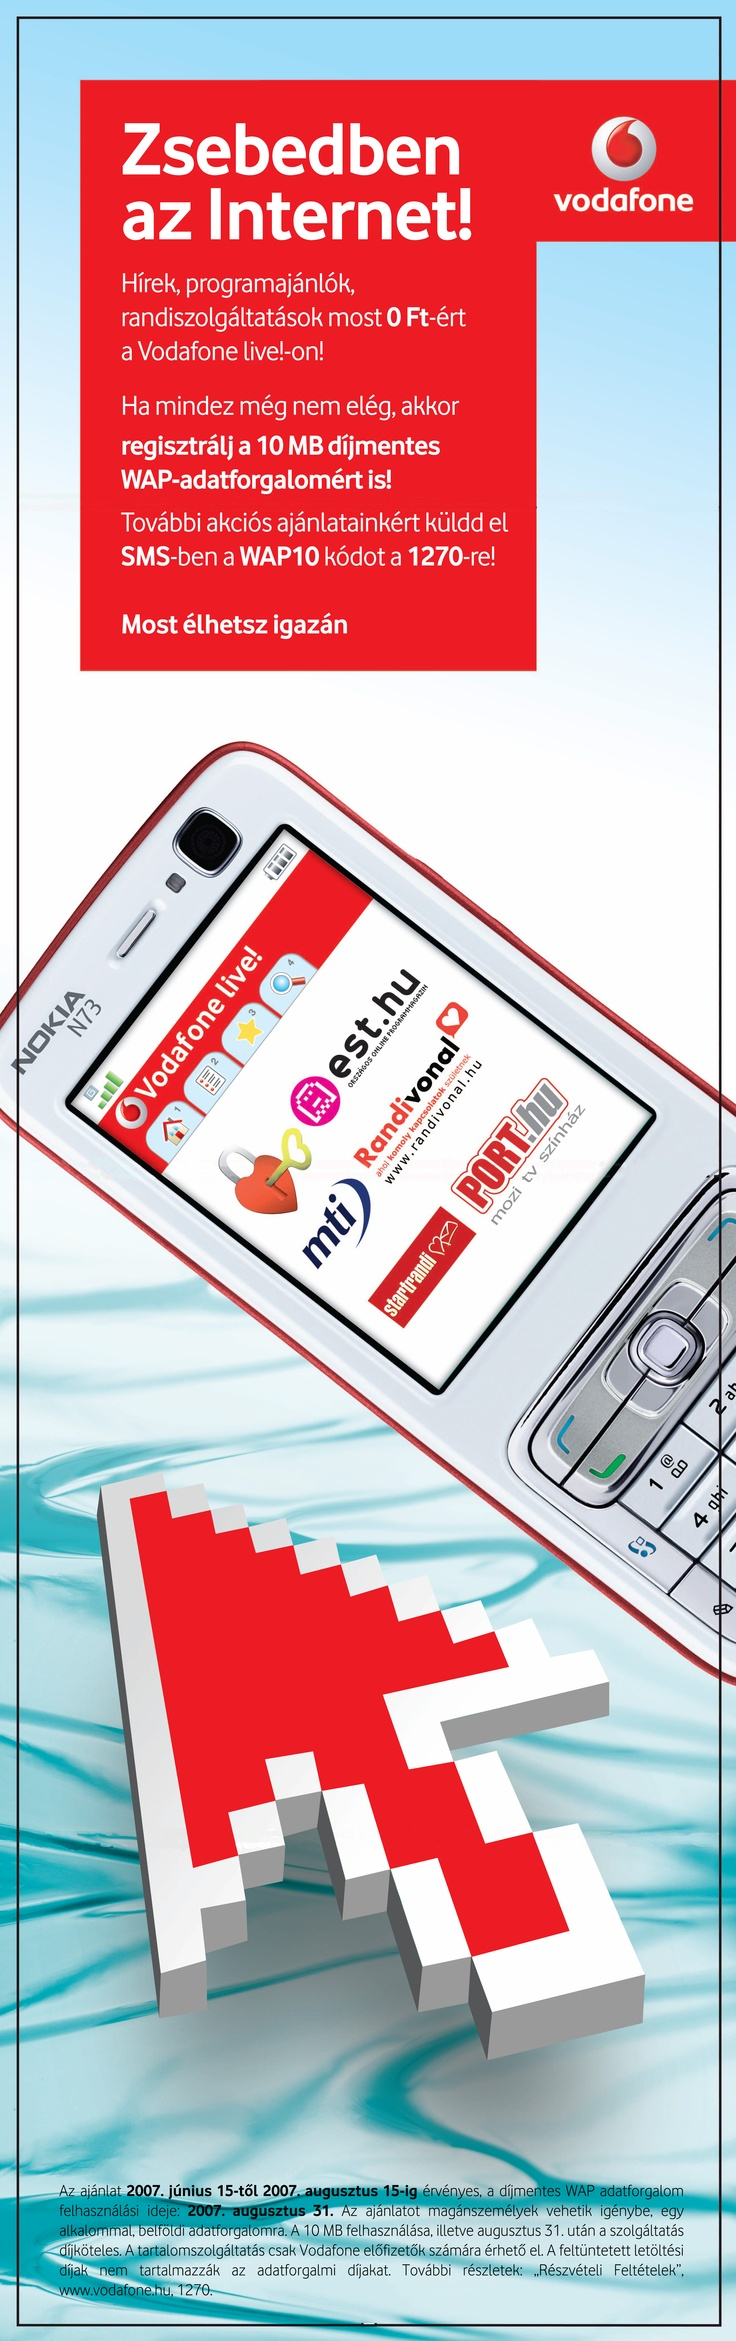 55 Best Vodafone Live Images On Pinterest Live Tv Commercials